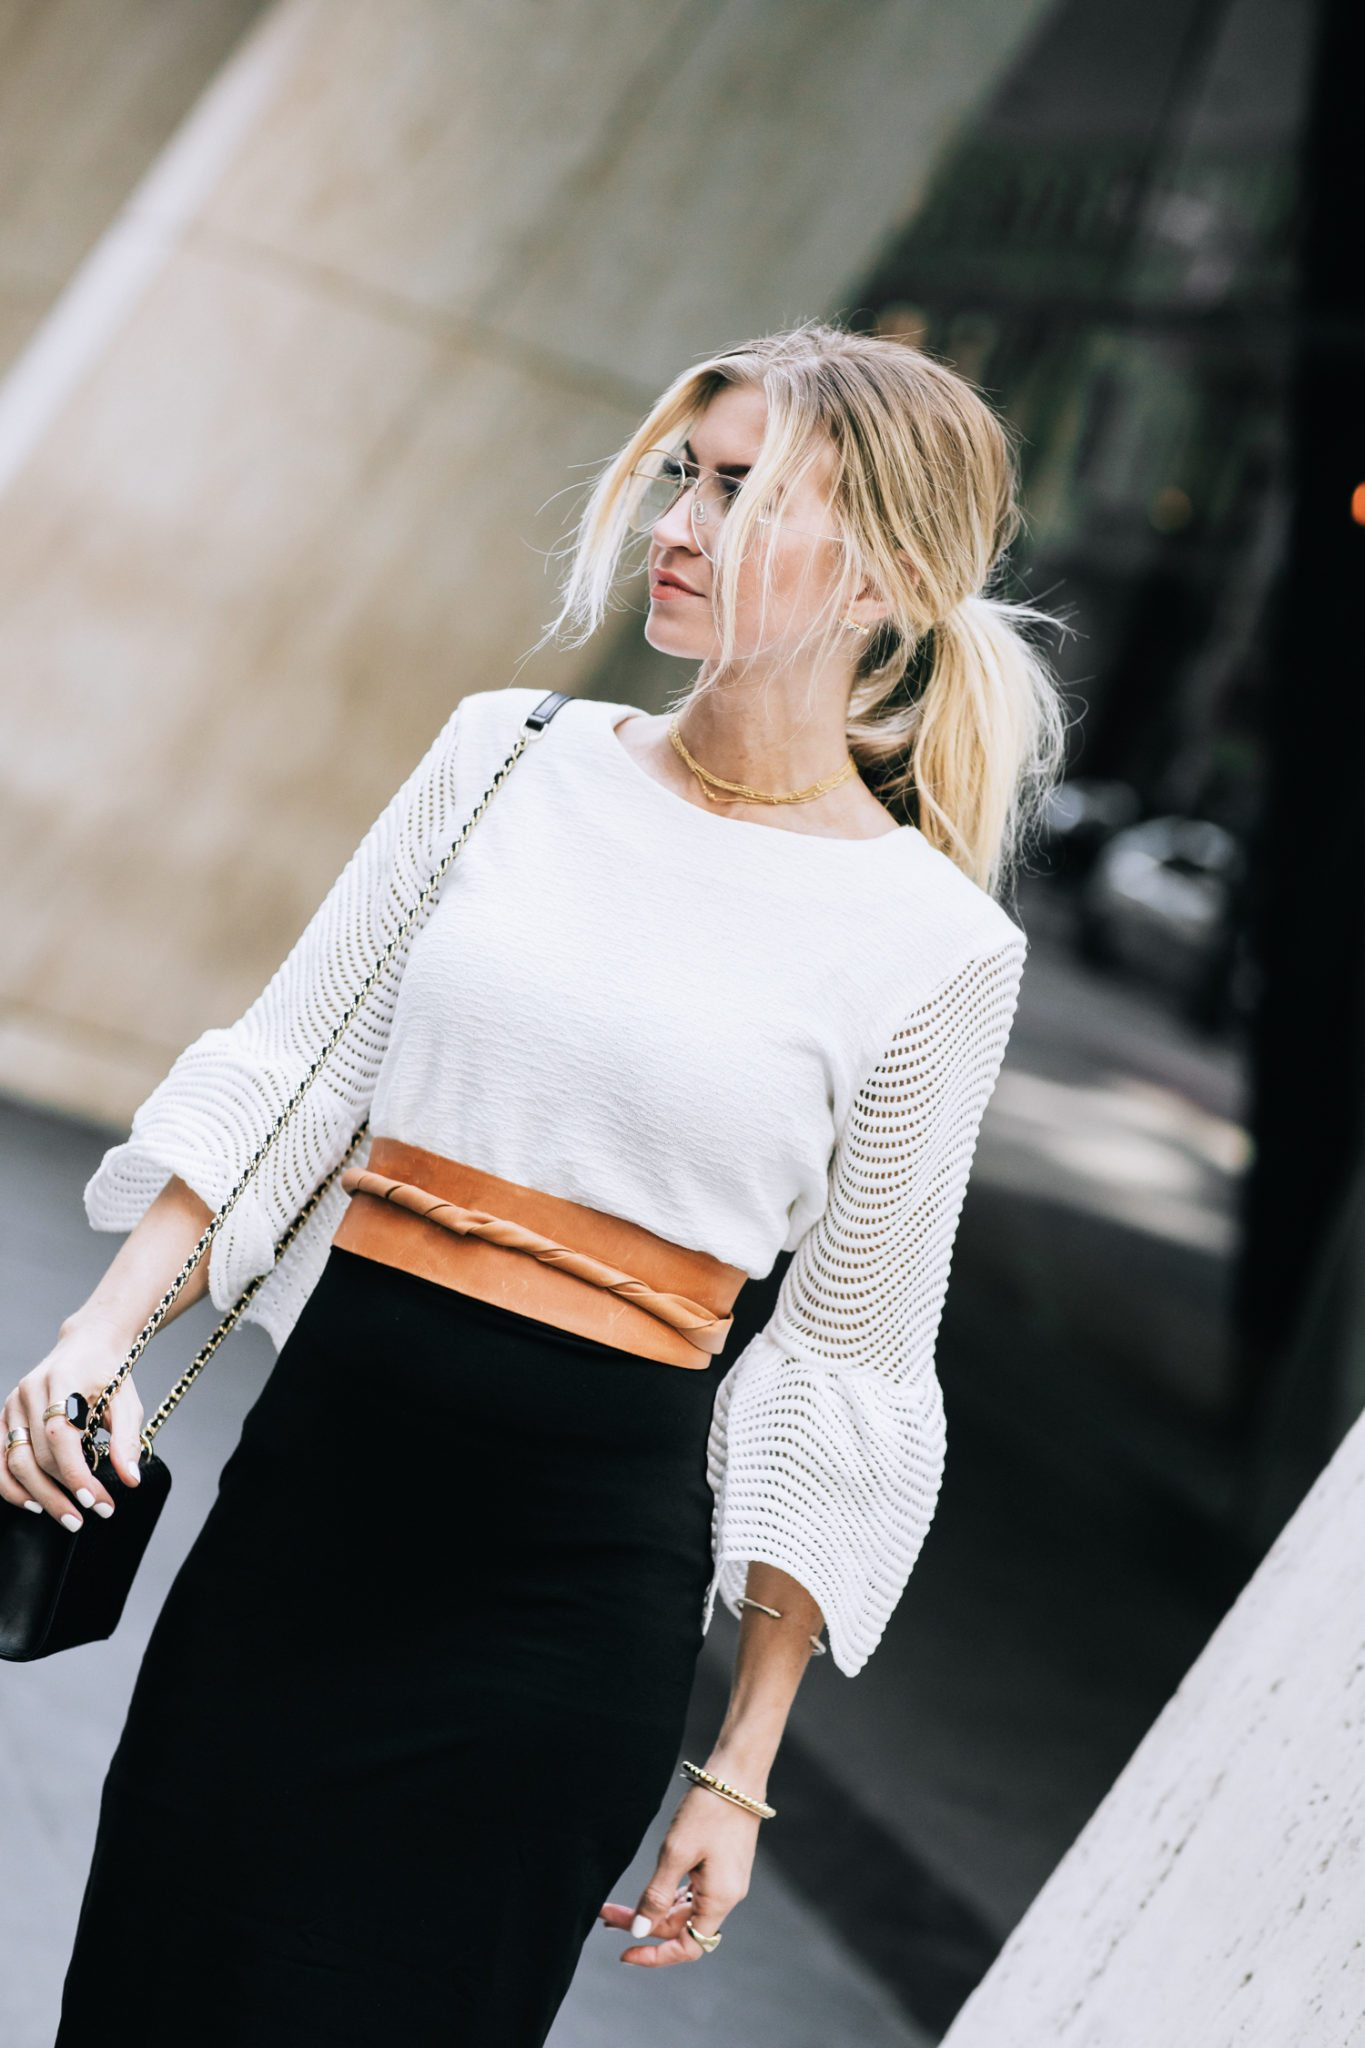 Black pencil skirt + wide cognac belt.